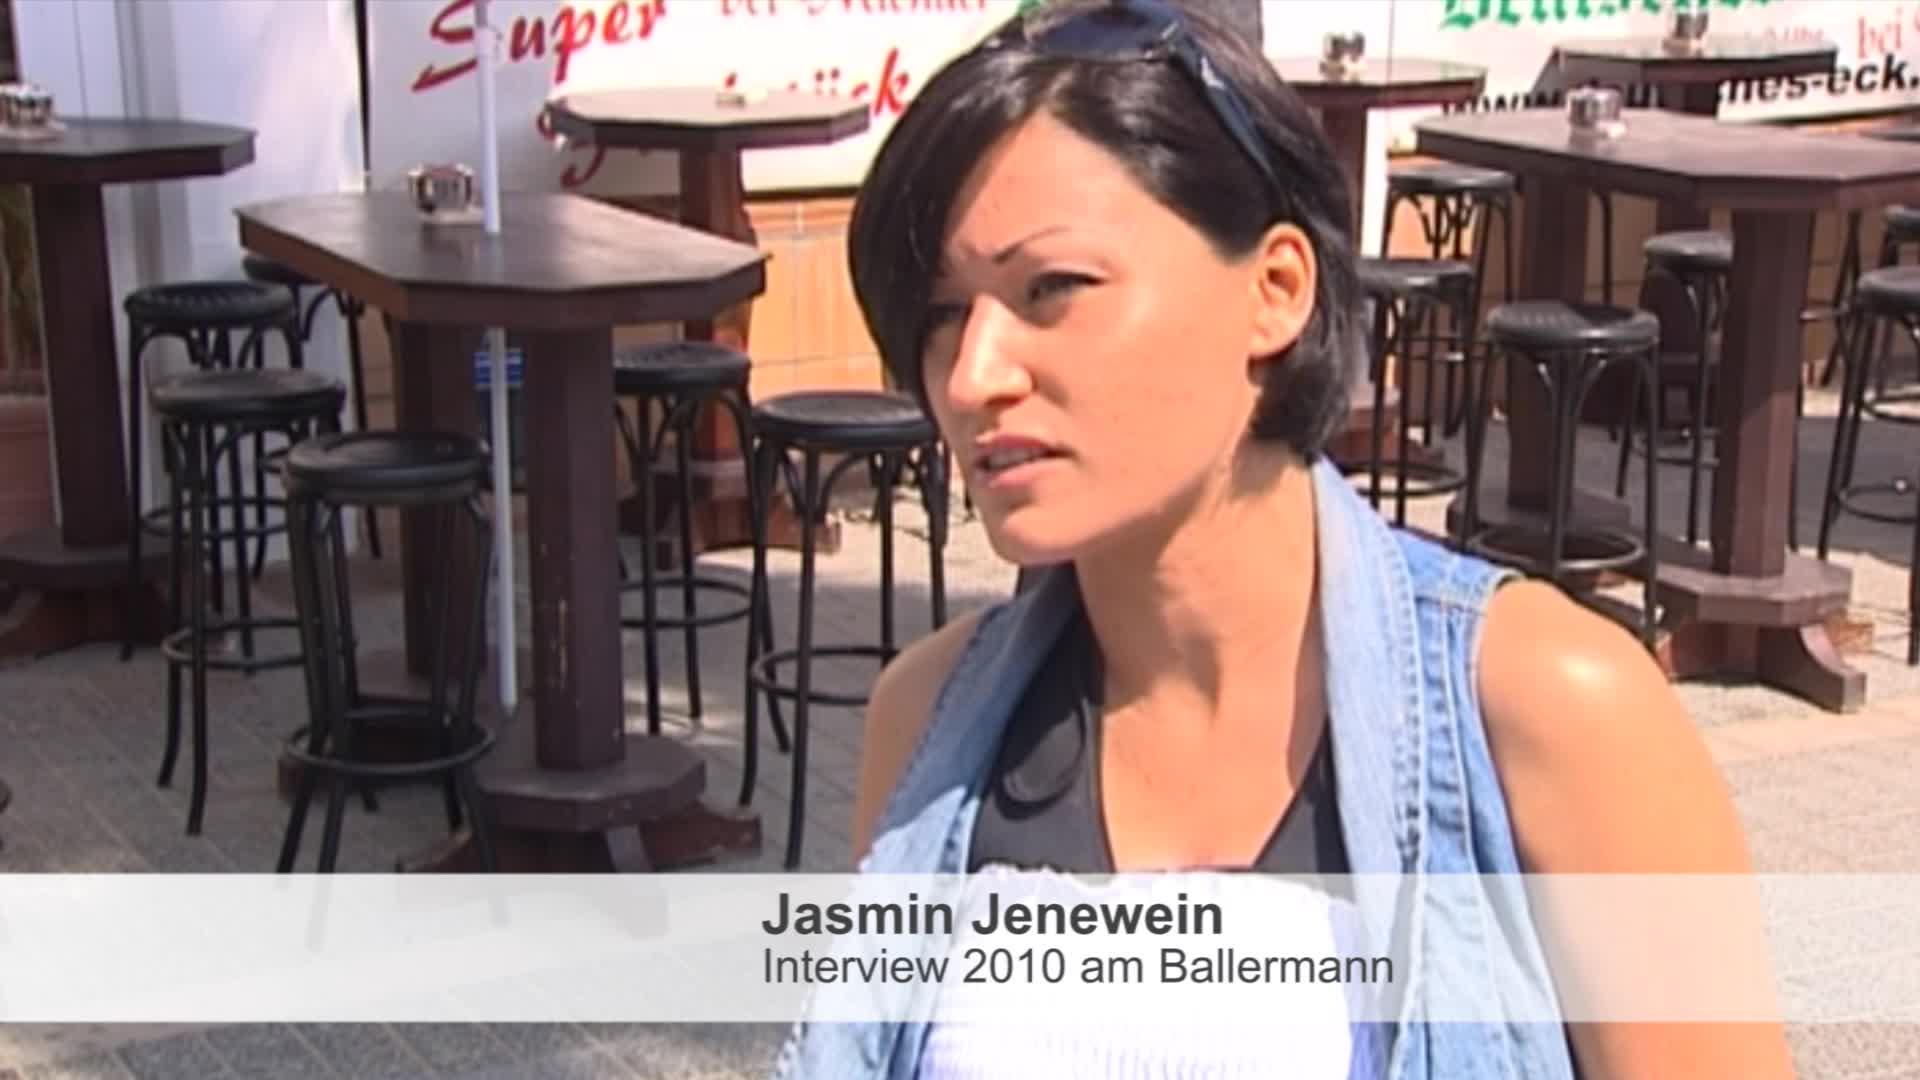 Jasmin jenewein nackt